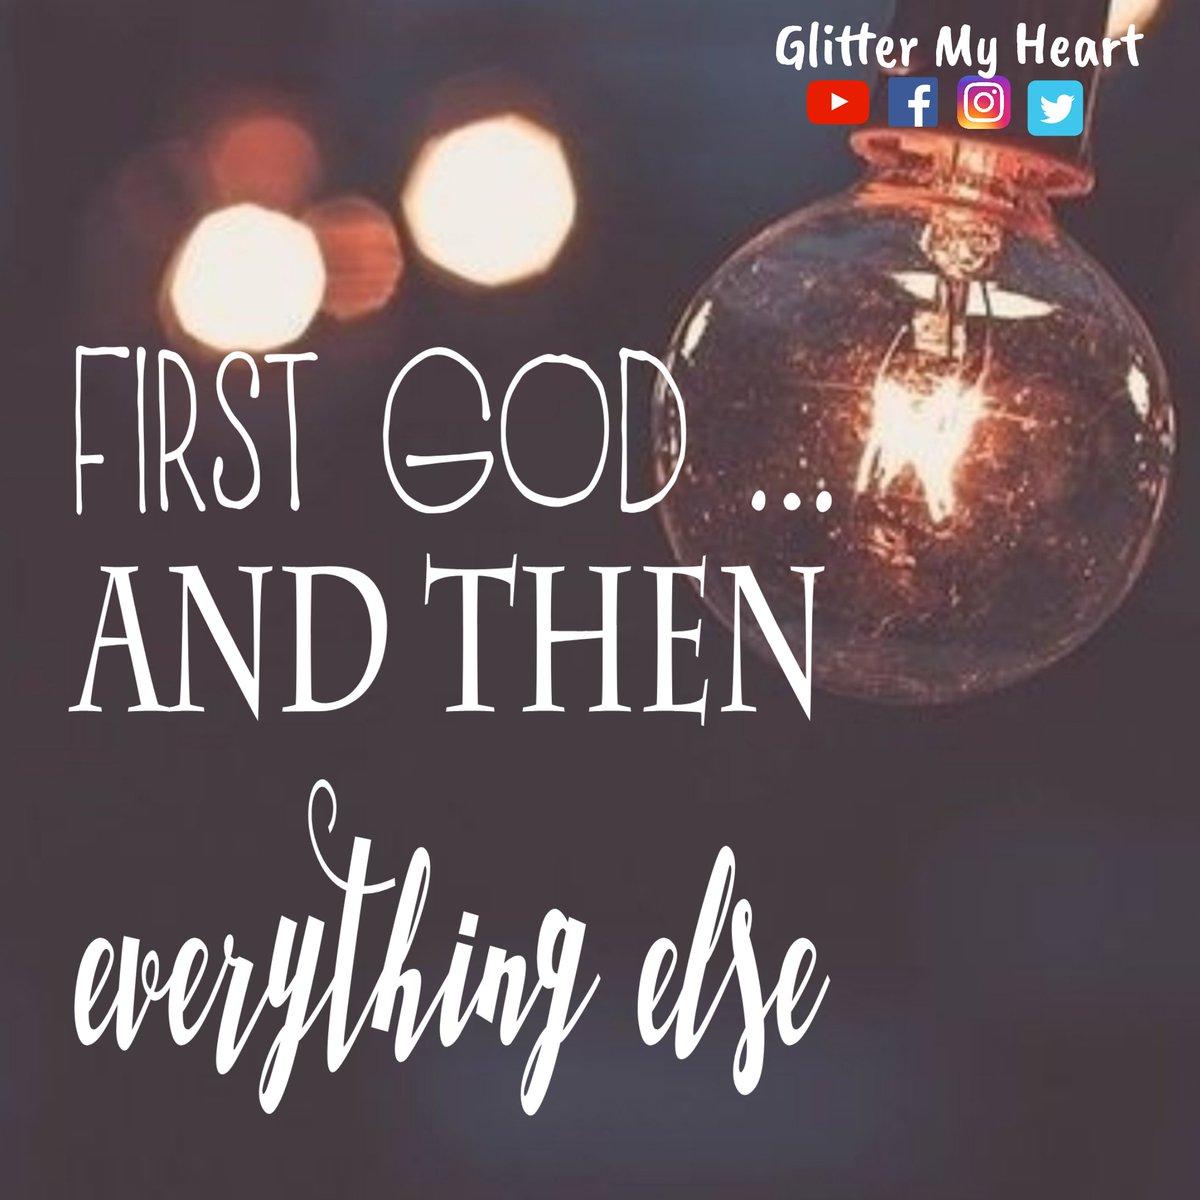 #God #peace #faith #love #eternallove #ok #Bible #bibleverse #christianlife #christian #bibleverseoftheday #Jesuschrist #wordofGod #followhim #heisfaithful #devotional #glitter #glittermyheart #glittermyheartchallenge #youtuber